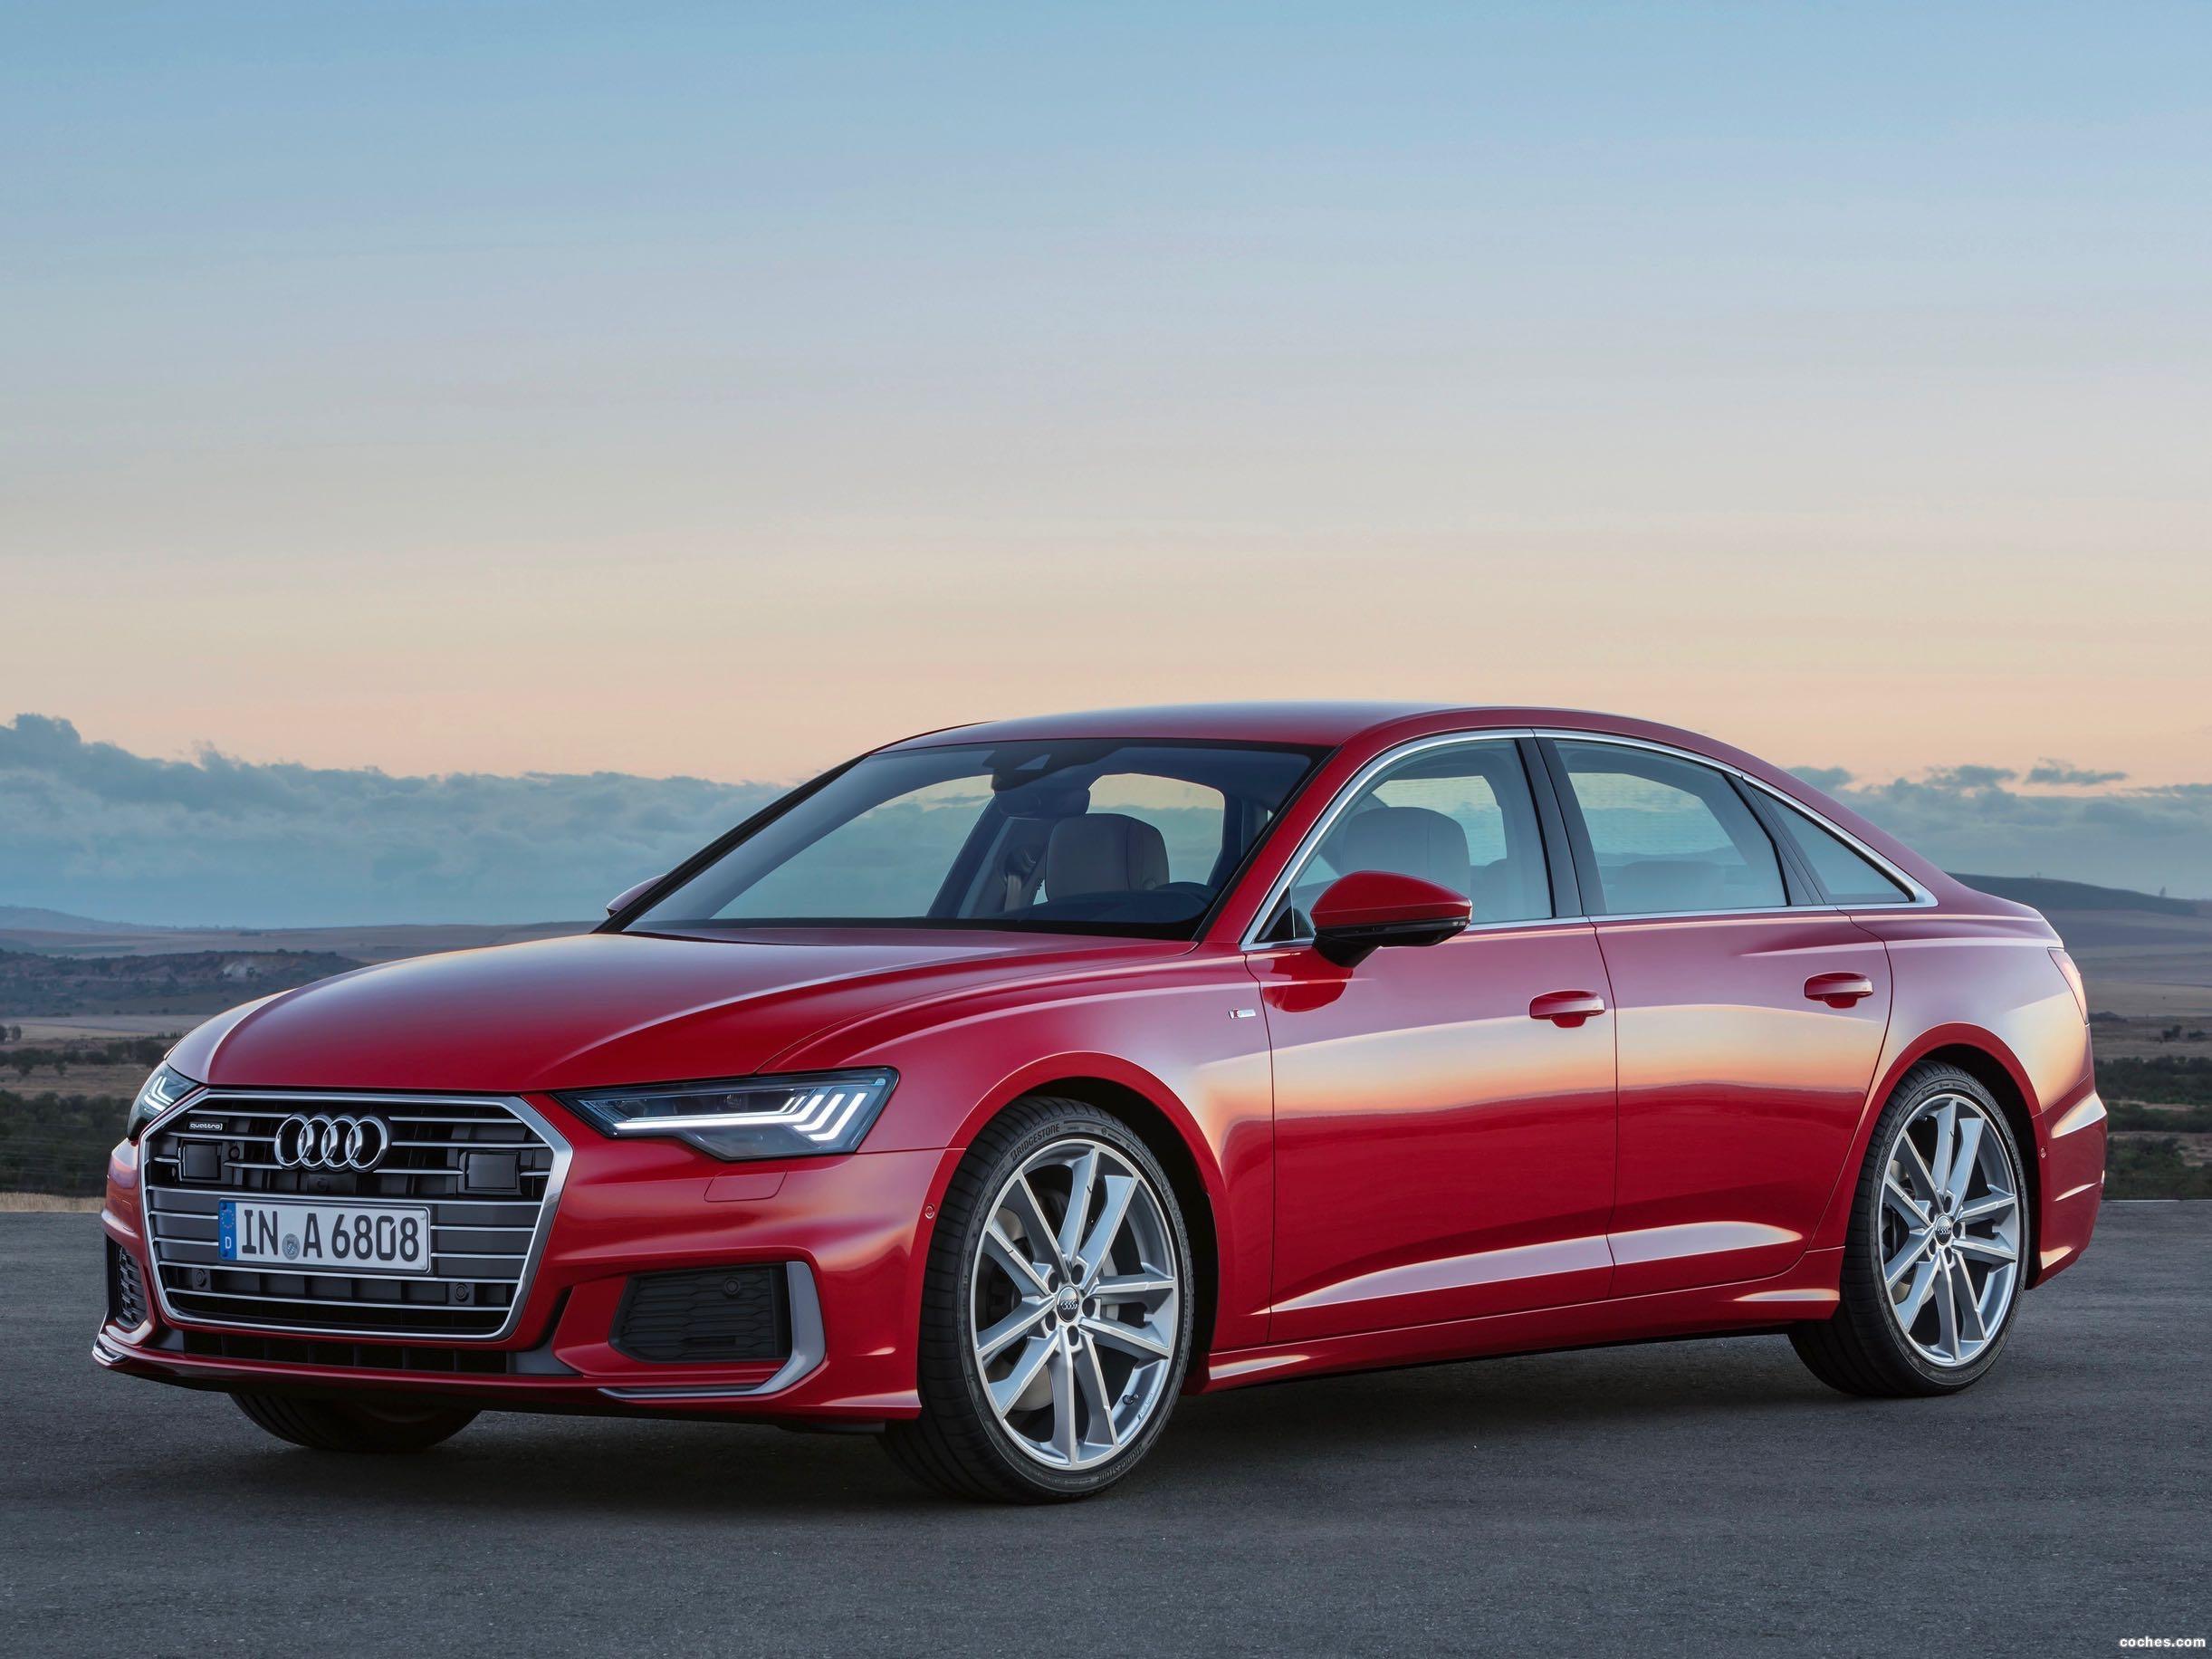 Foto 10 de Audi A6 55 TFSI quattro S line 2018